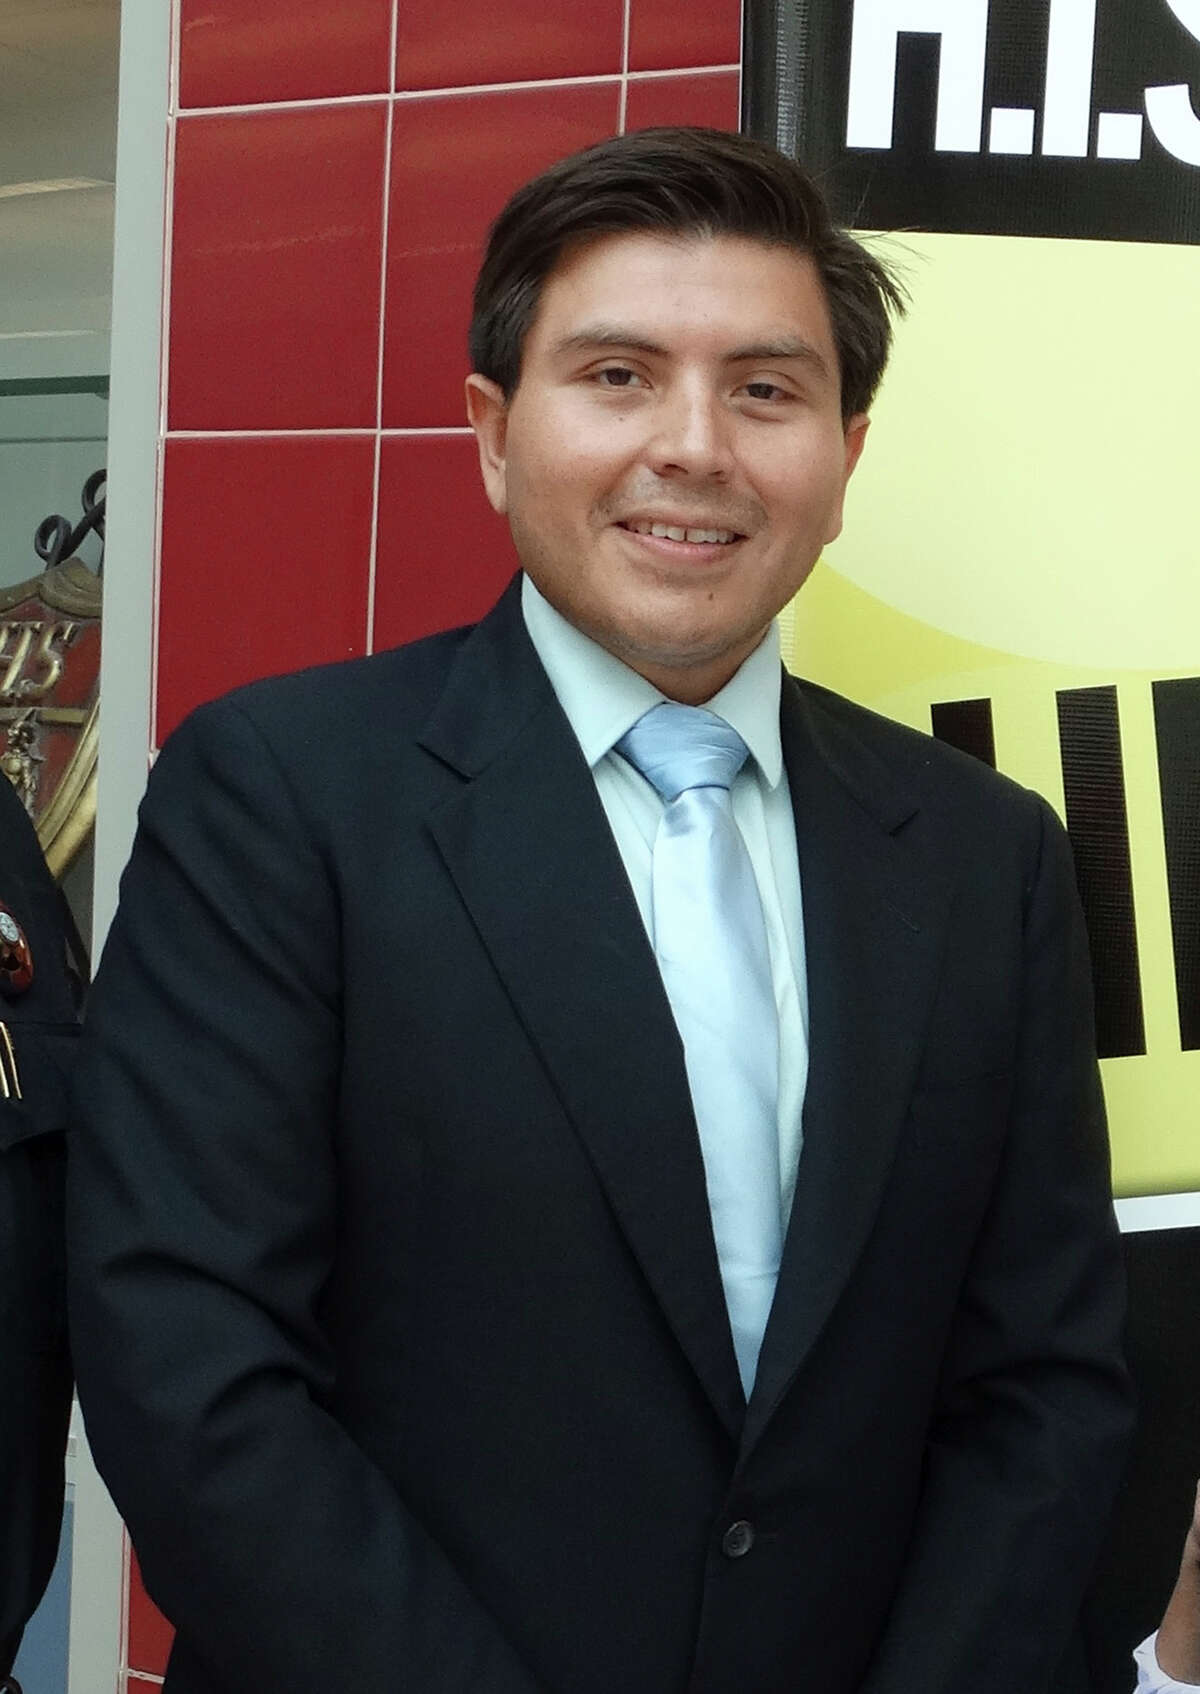 Ricardo Moreno, the District 7 trustee on the Harlandale ISD board.